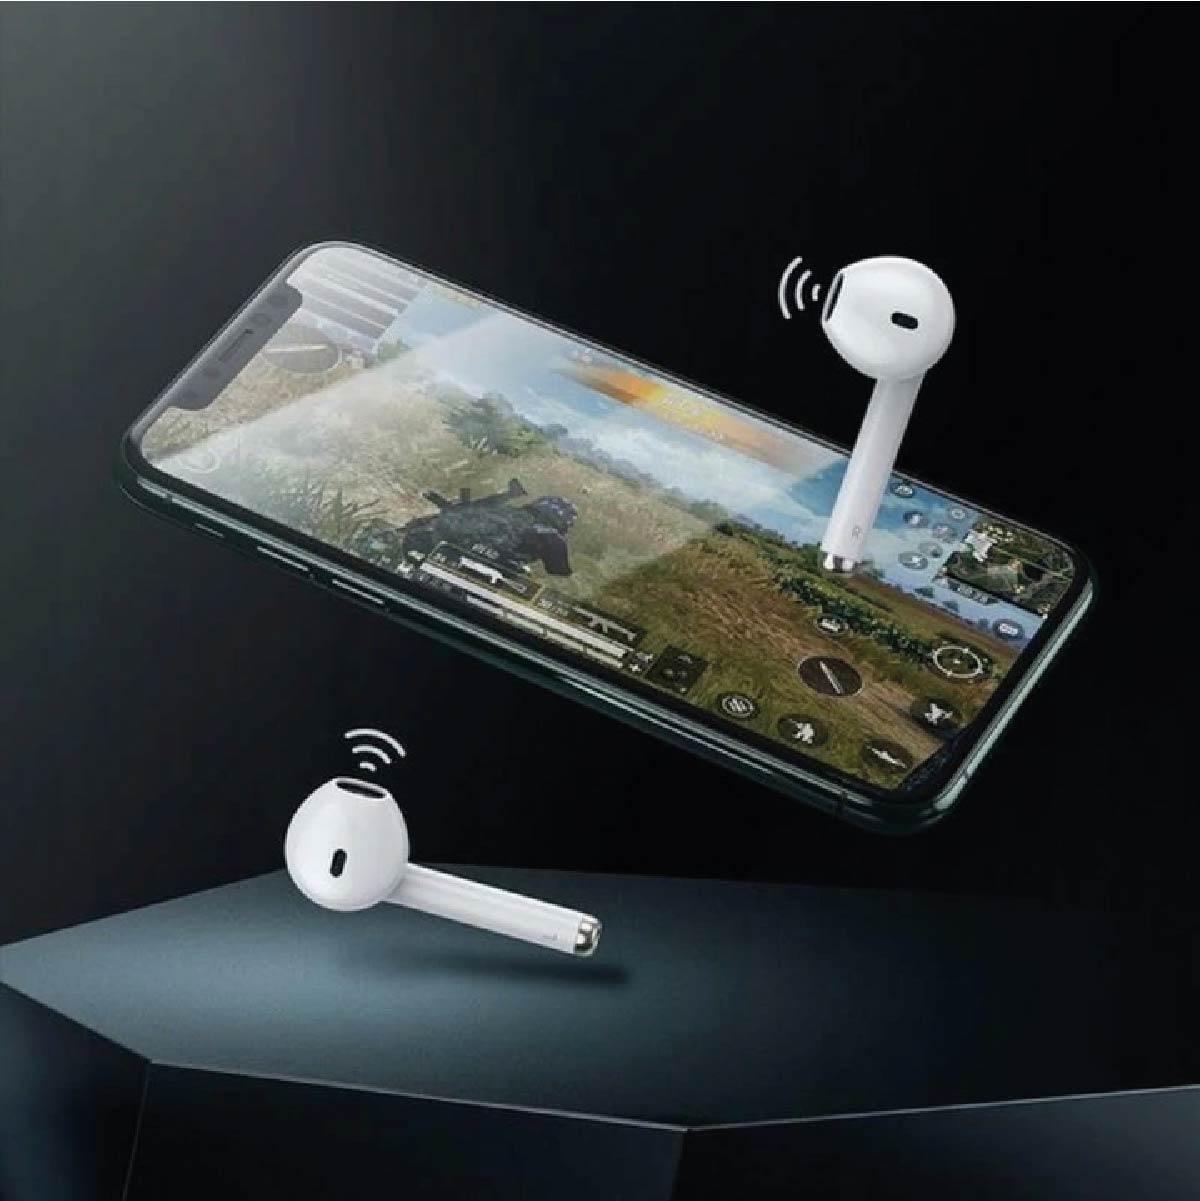 Fone de Ouvido Baseus Encok W04 Pro TWS Bluetooth 5.0 Touch -  Branco